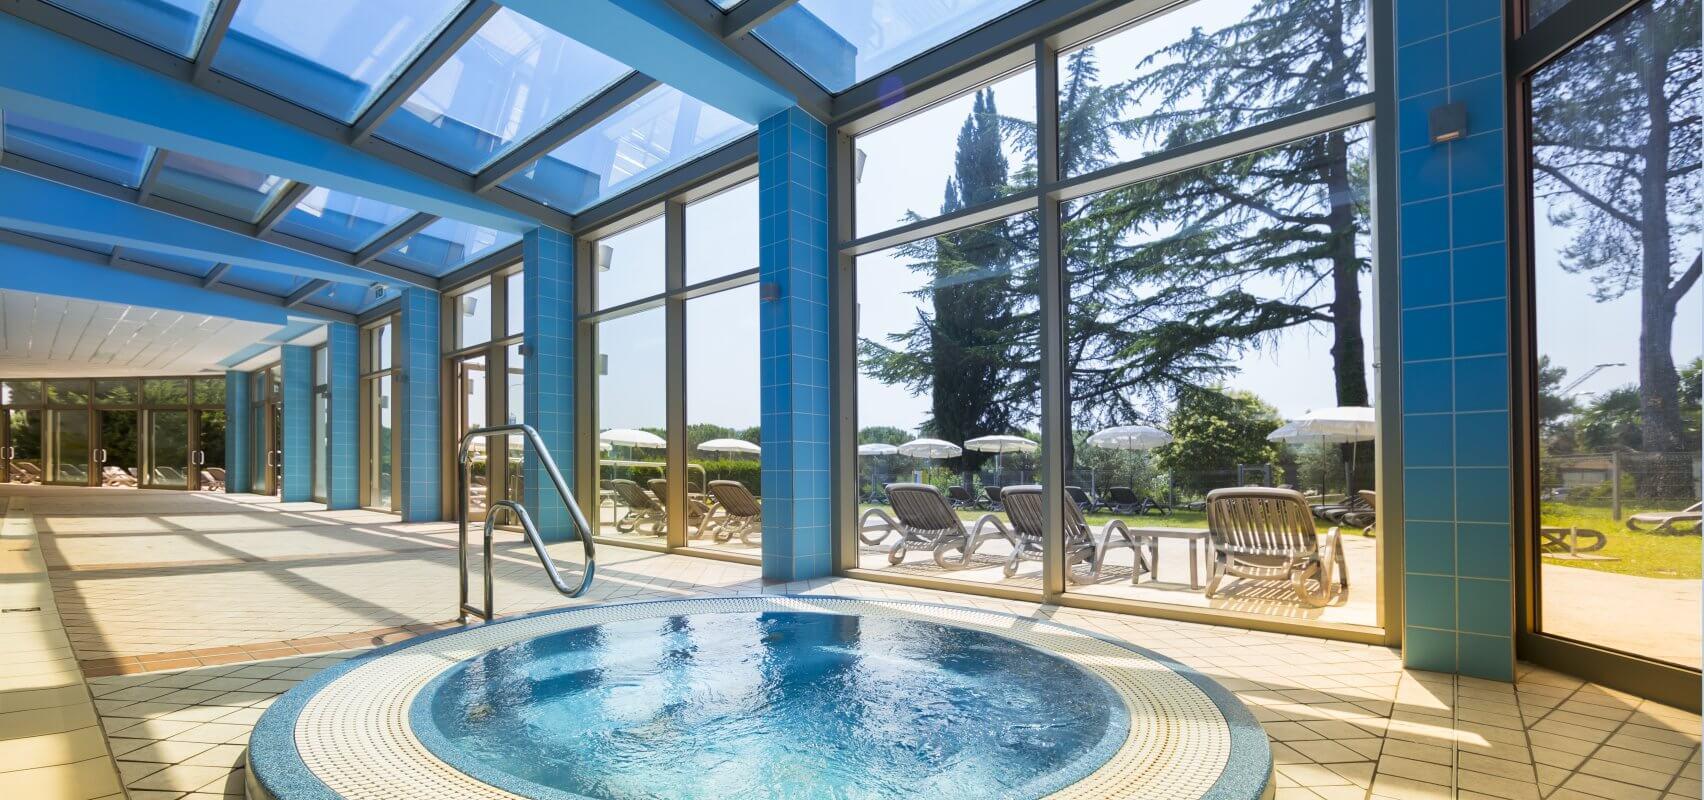 Bellevue Hotel Dubrovnik Spa